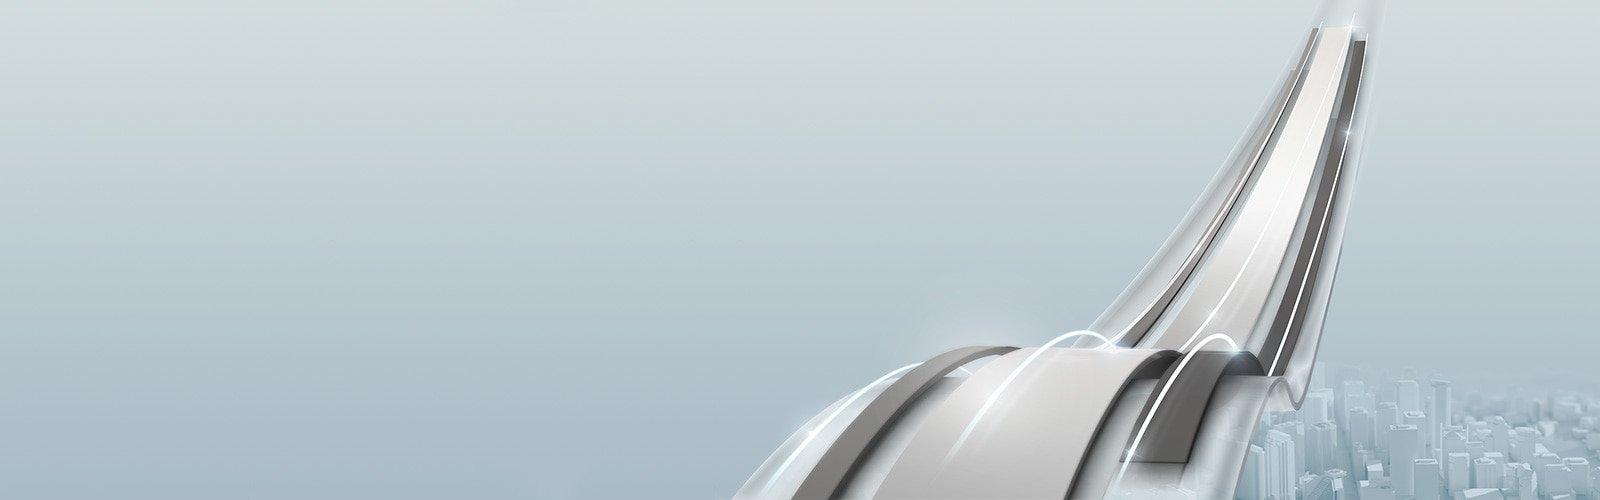 cw22lg-gdpr-cloud-platform-3844127